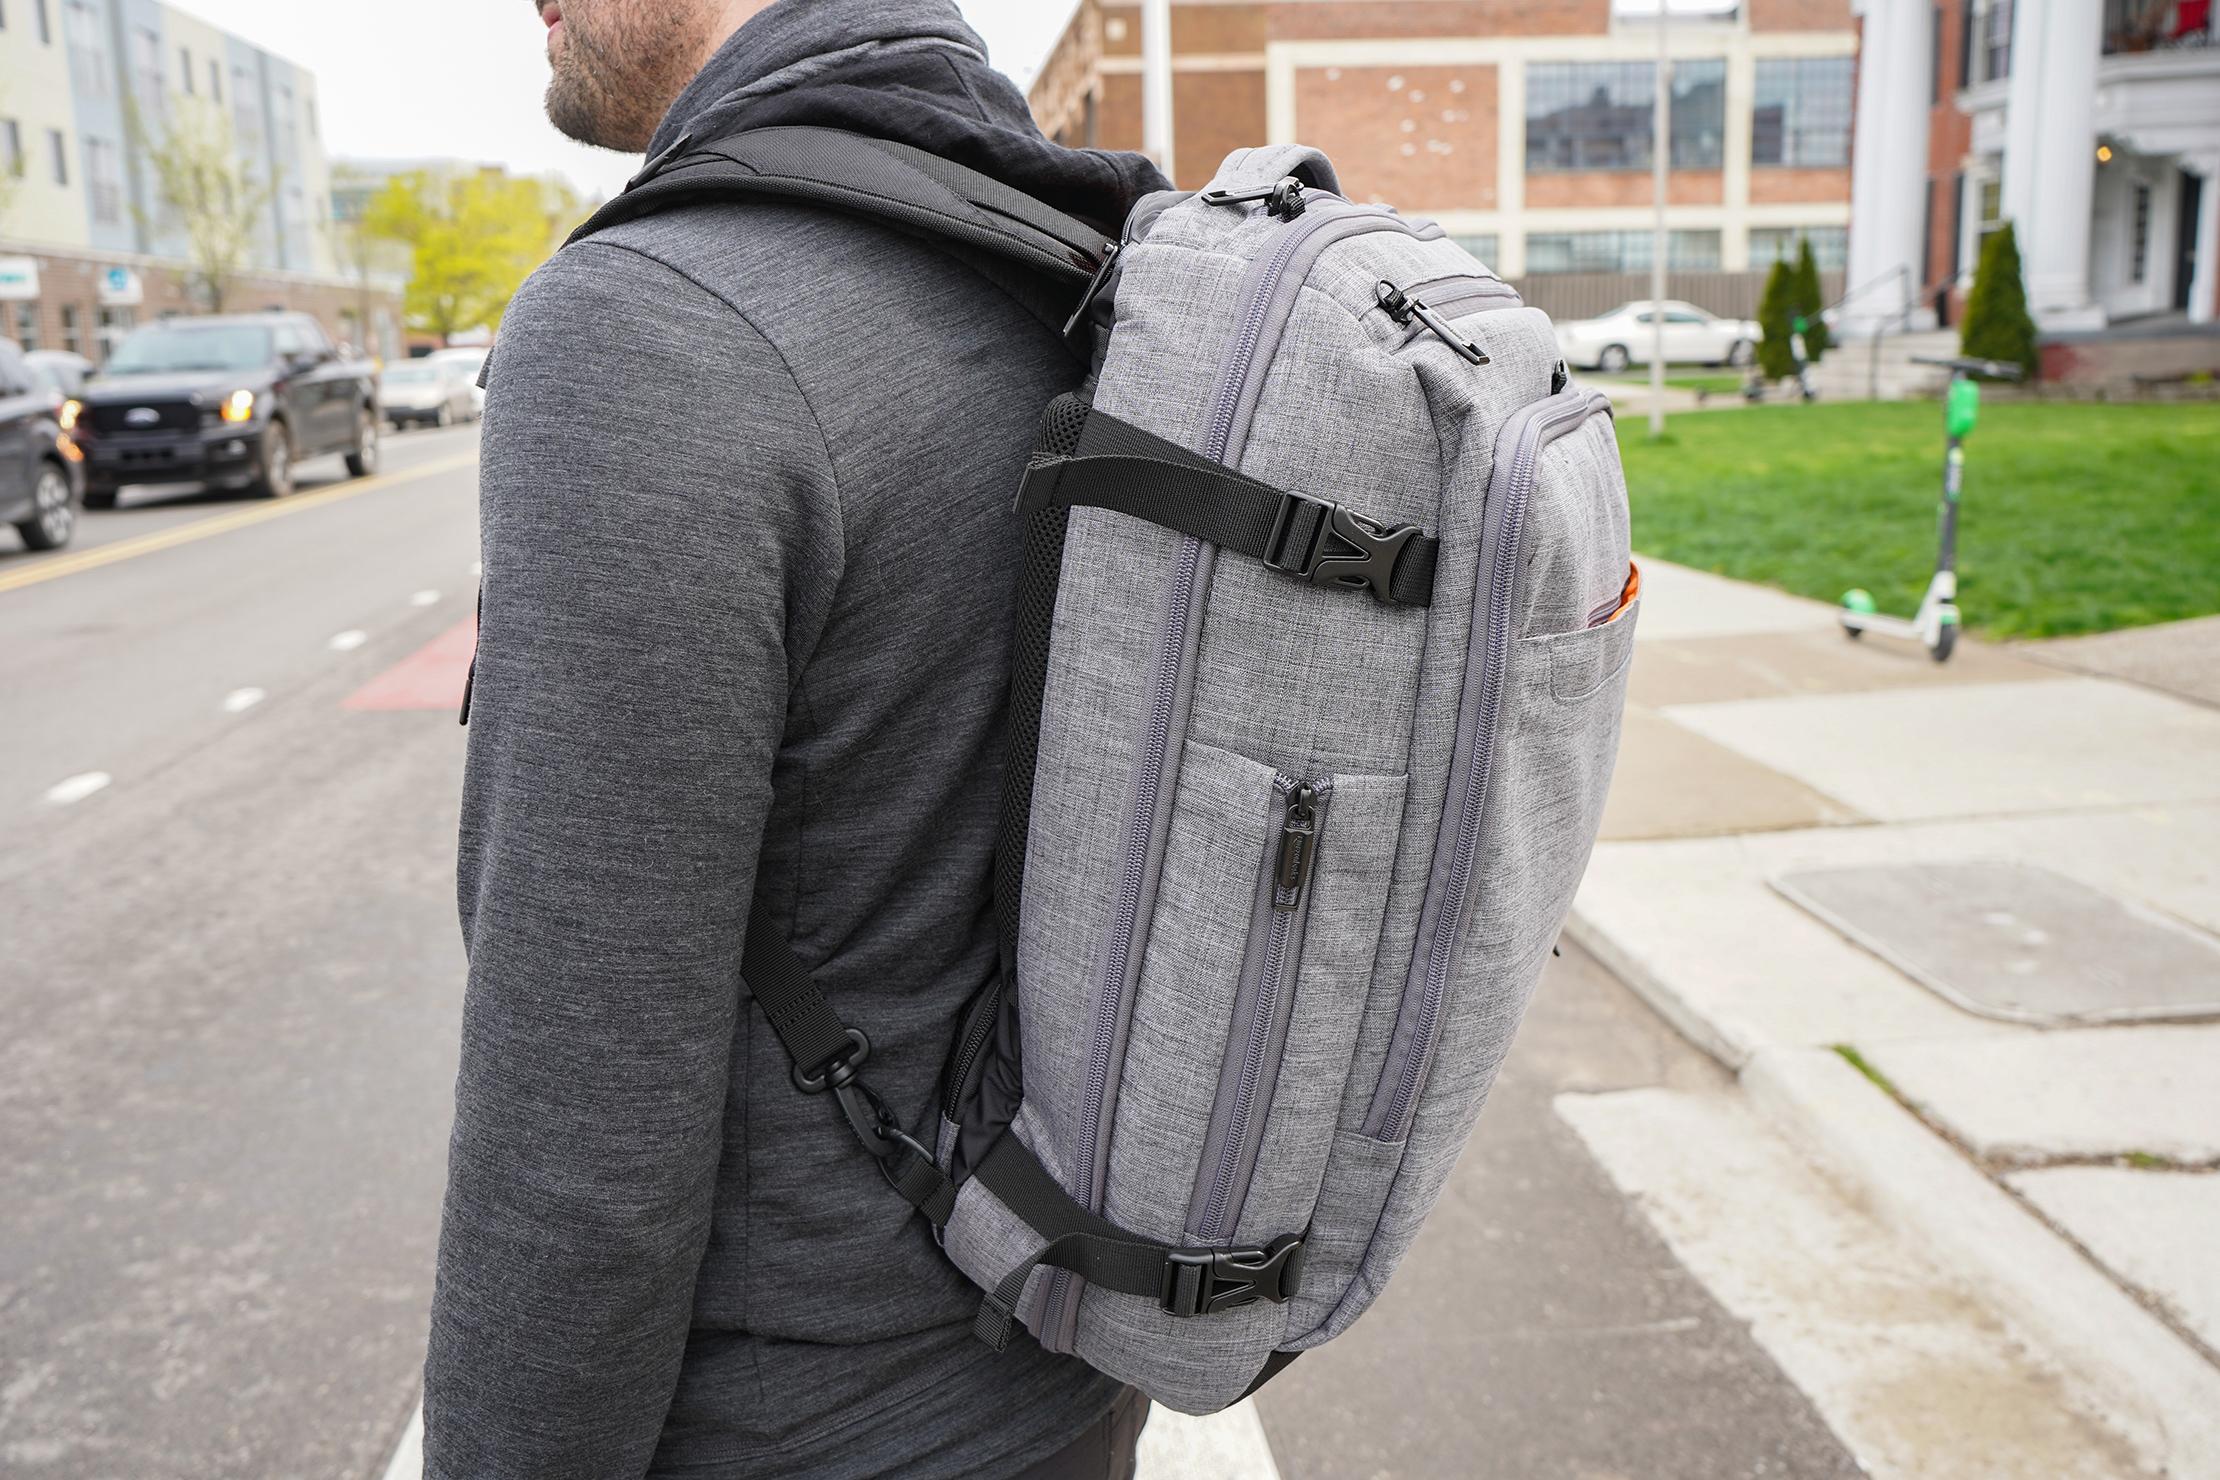 AmazonBasics Slim Travel Backpack Weekender Compression Straps